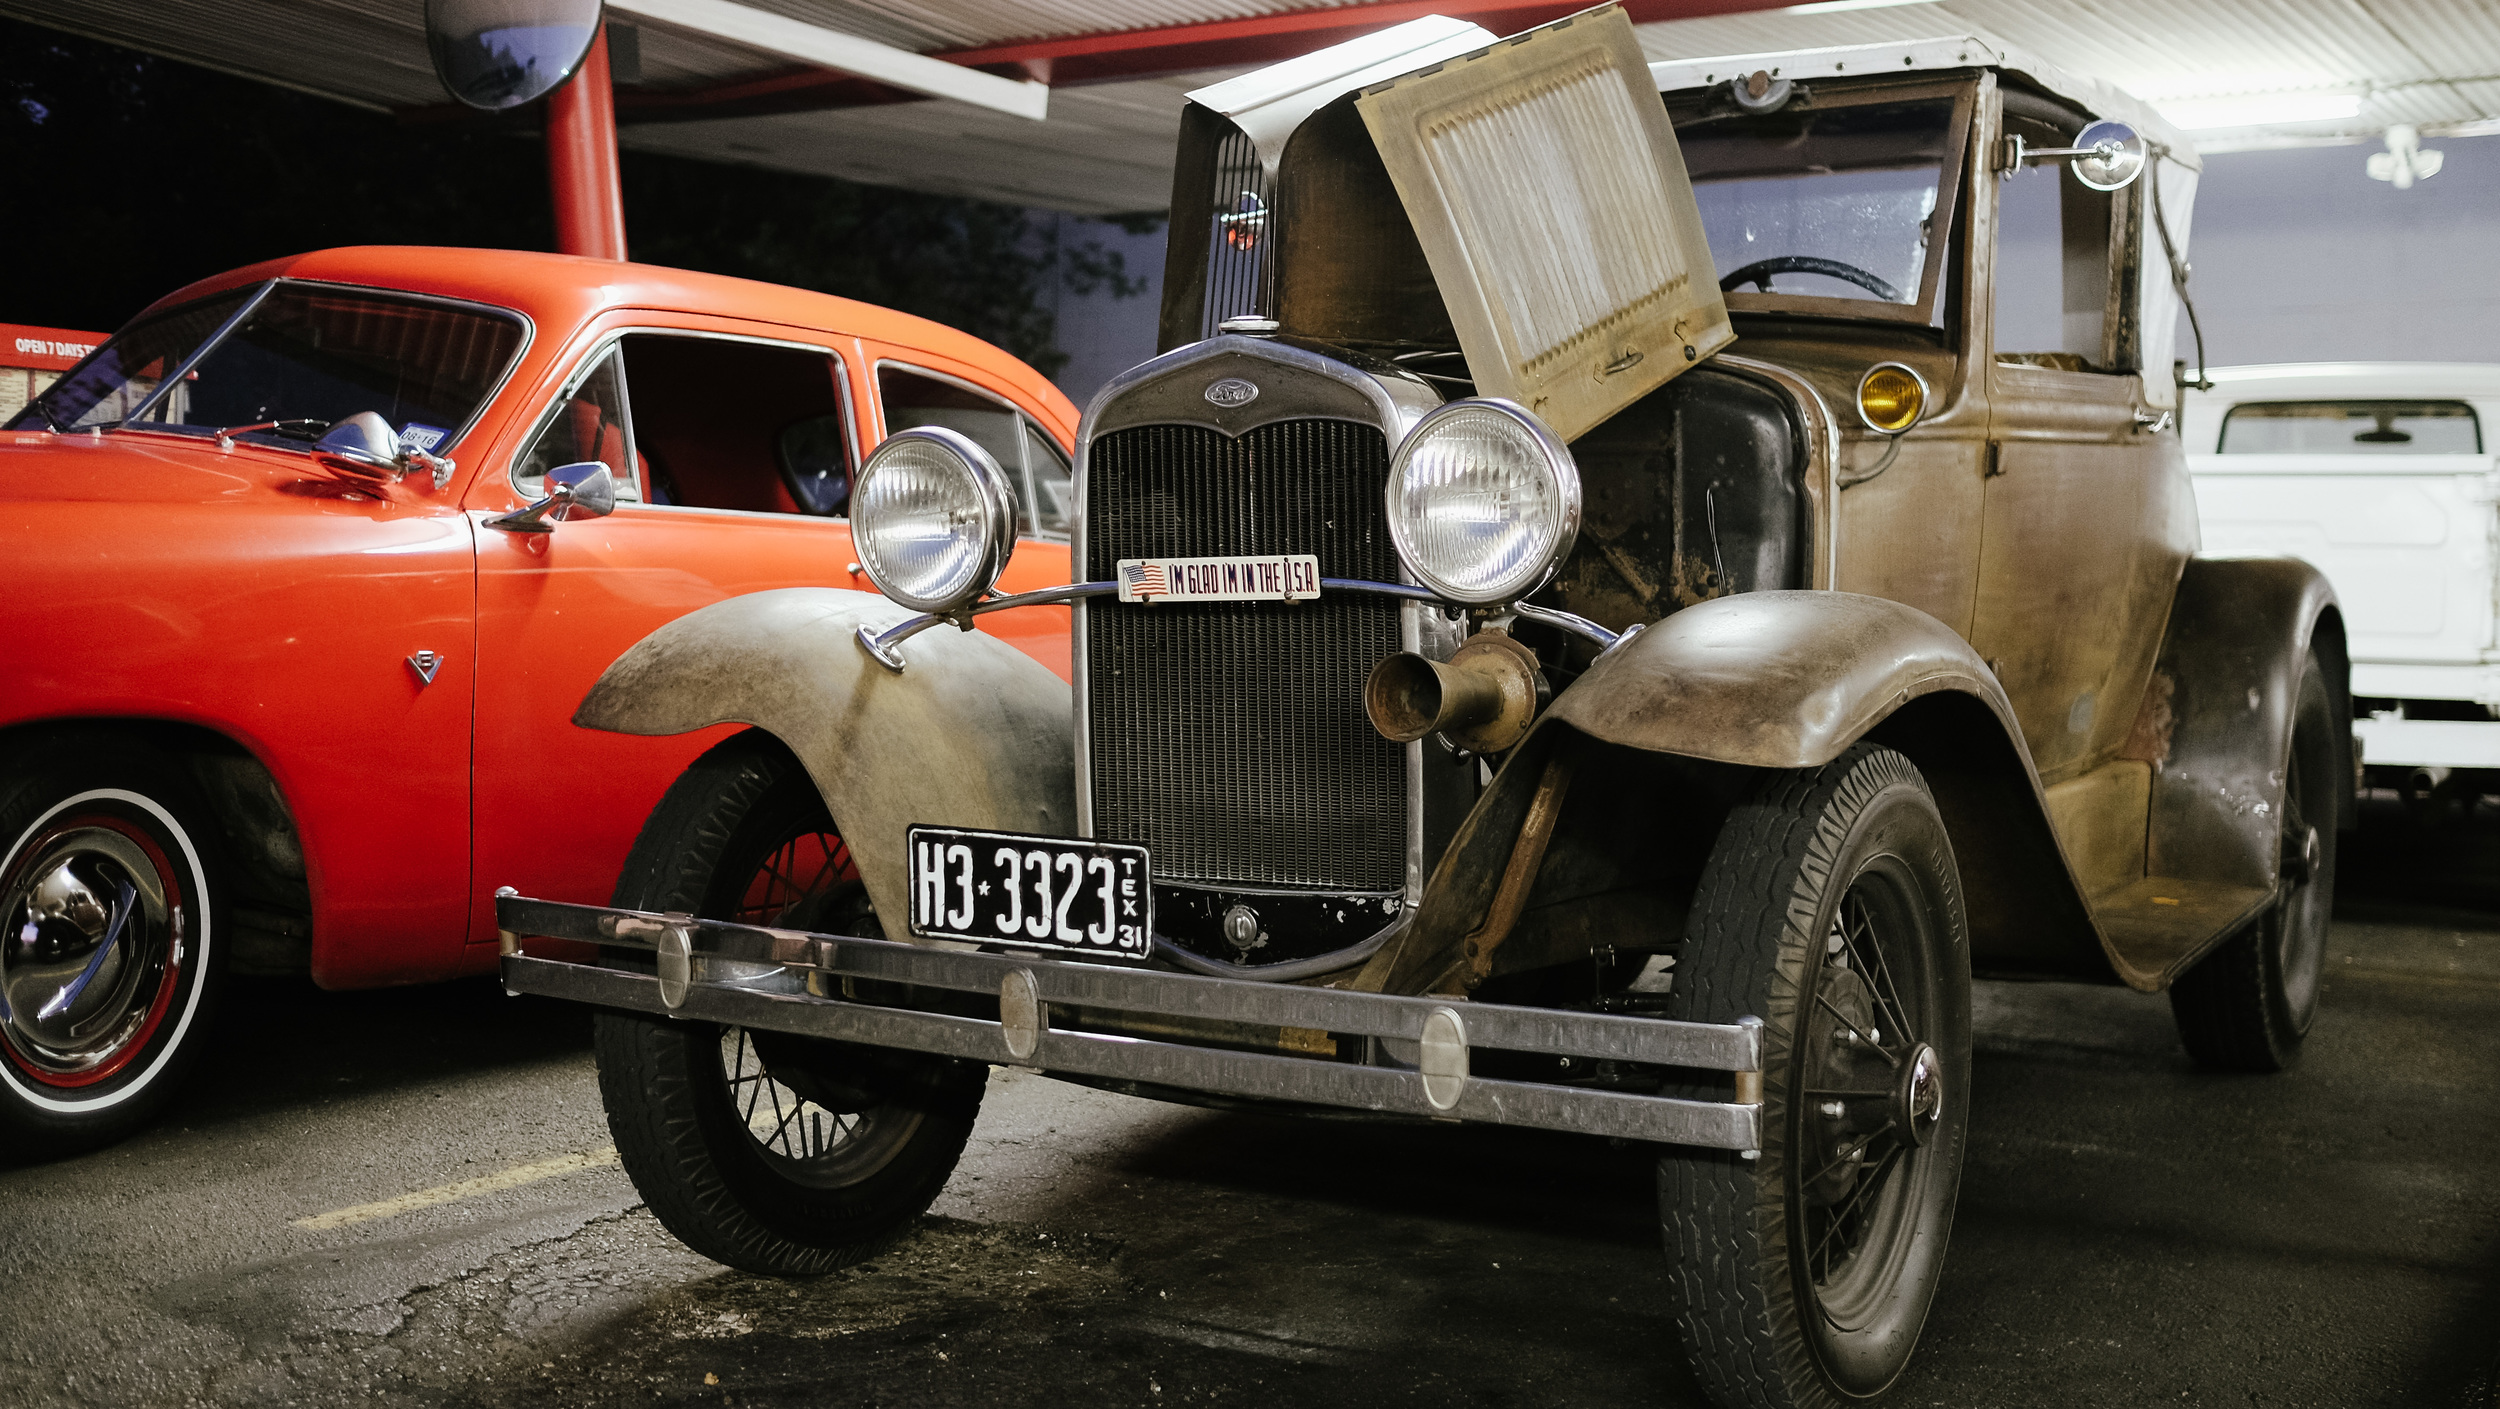 Top-Notch-Car-Show-09052015-2641.jpg